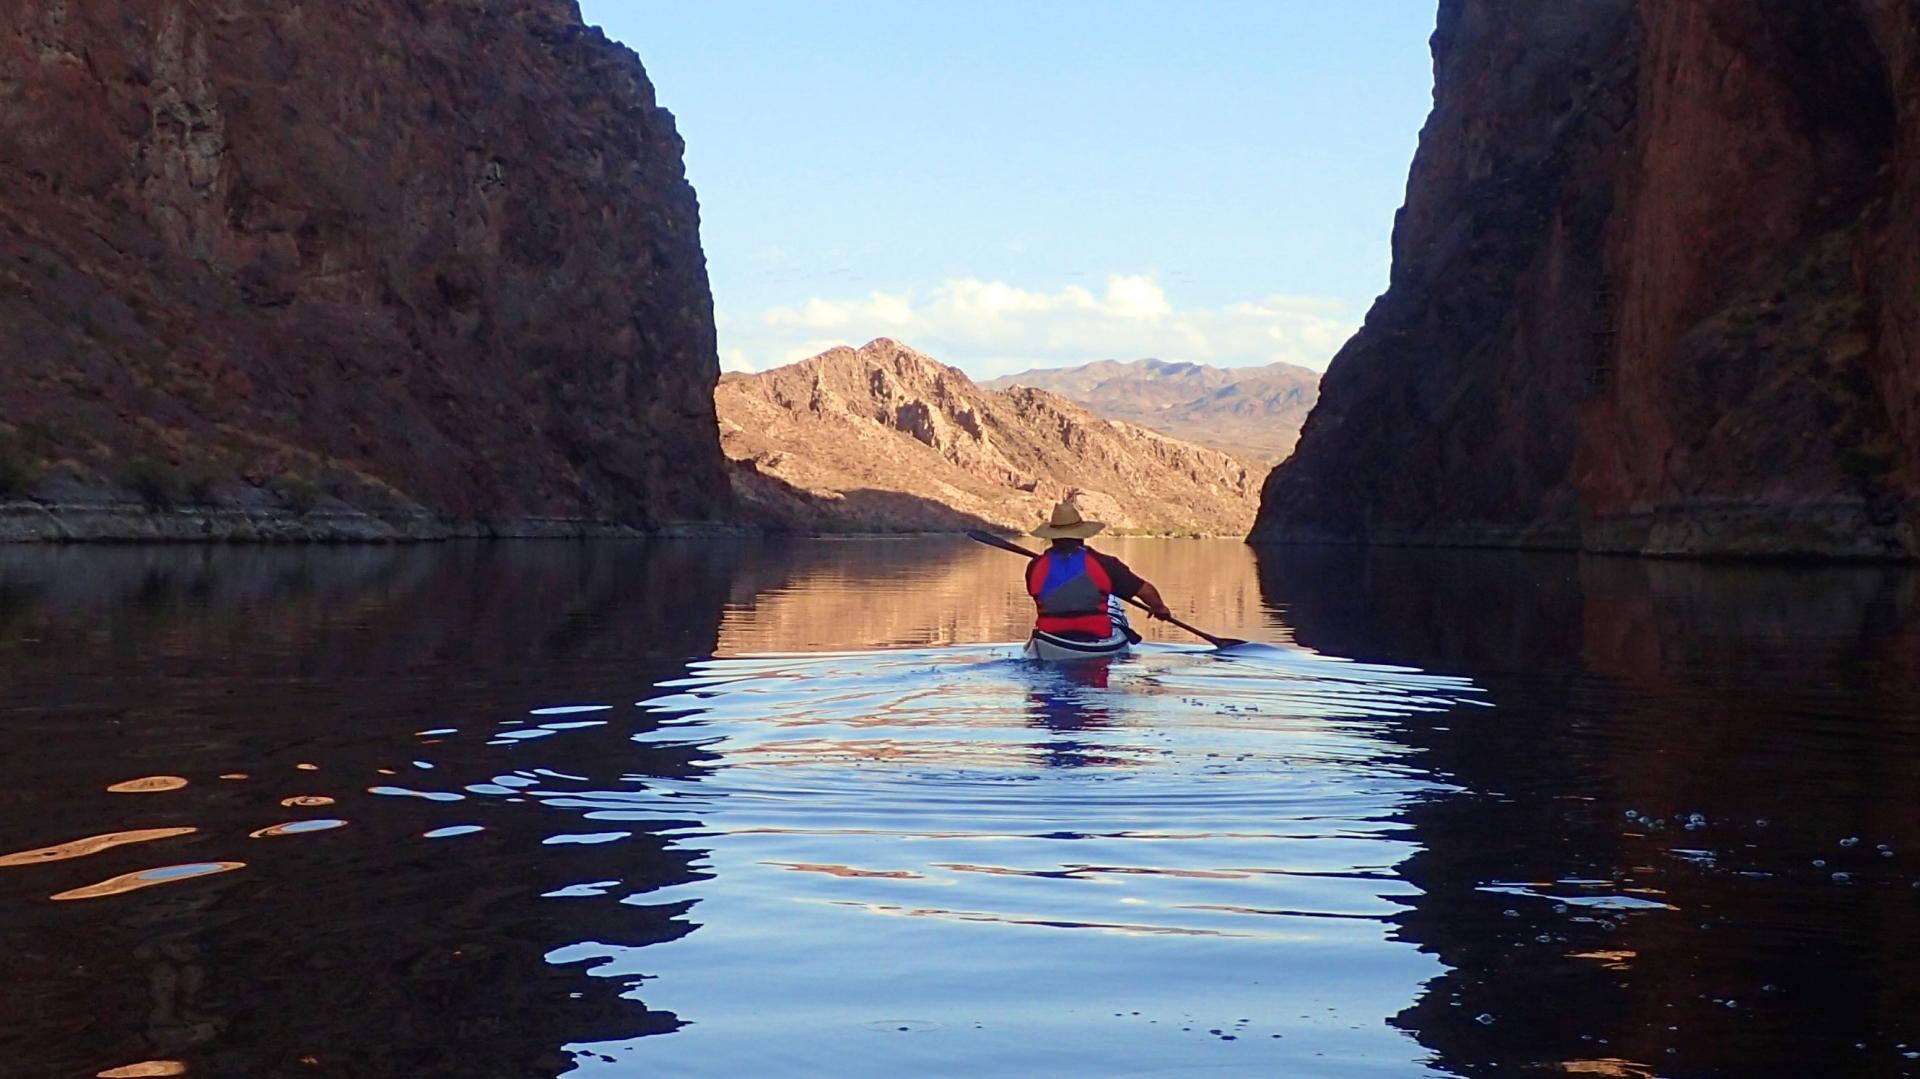 Morgan Eisen paddling through the narrows of the Black Canyon